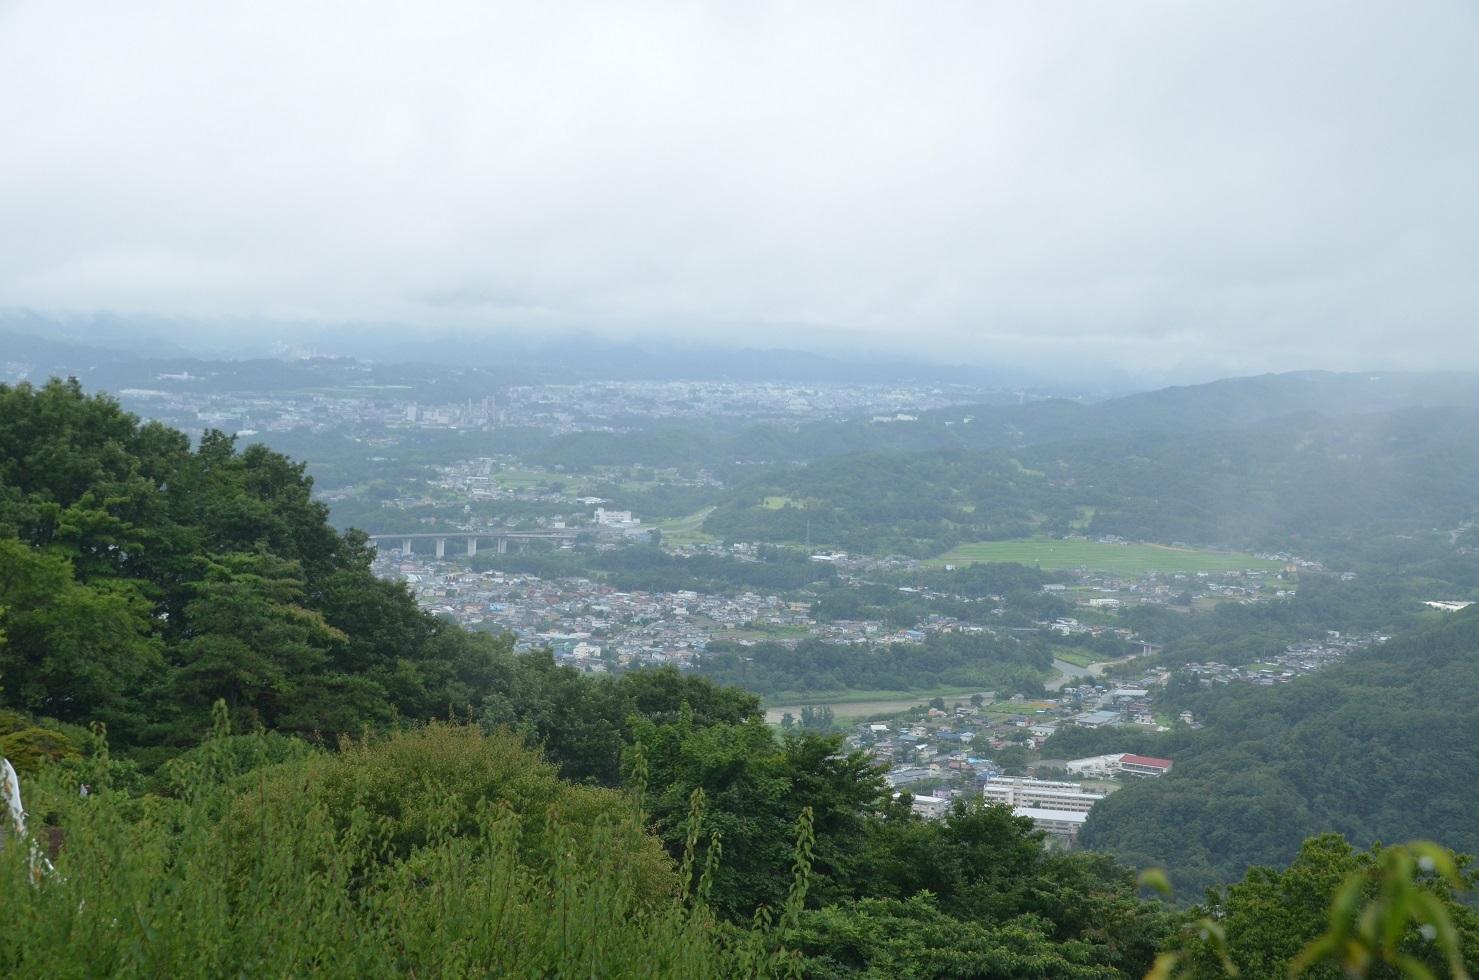 DSC_0113上からの長瀞町